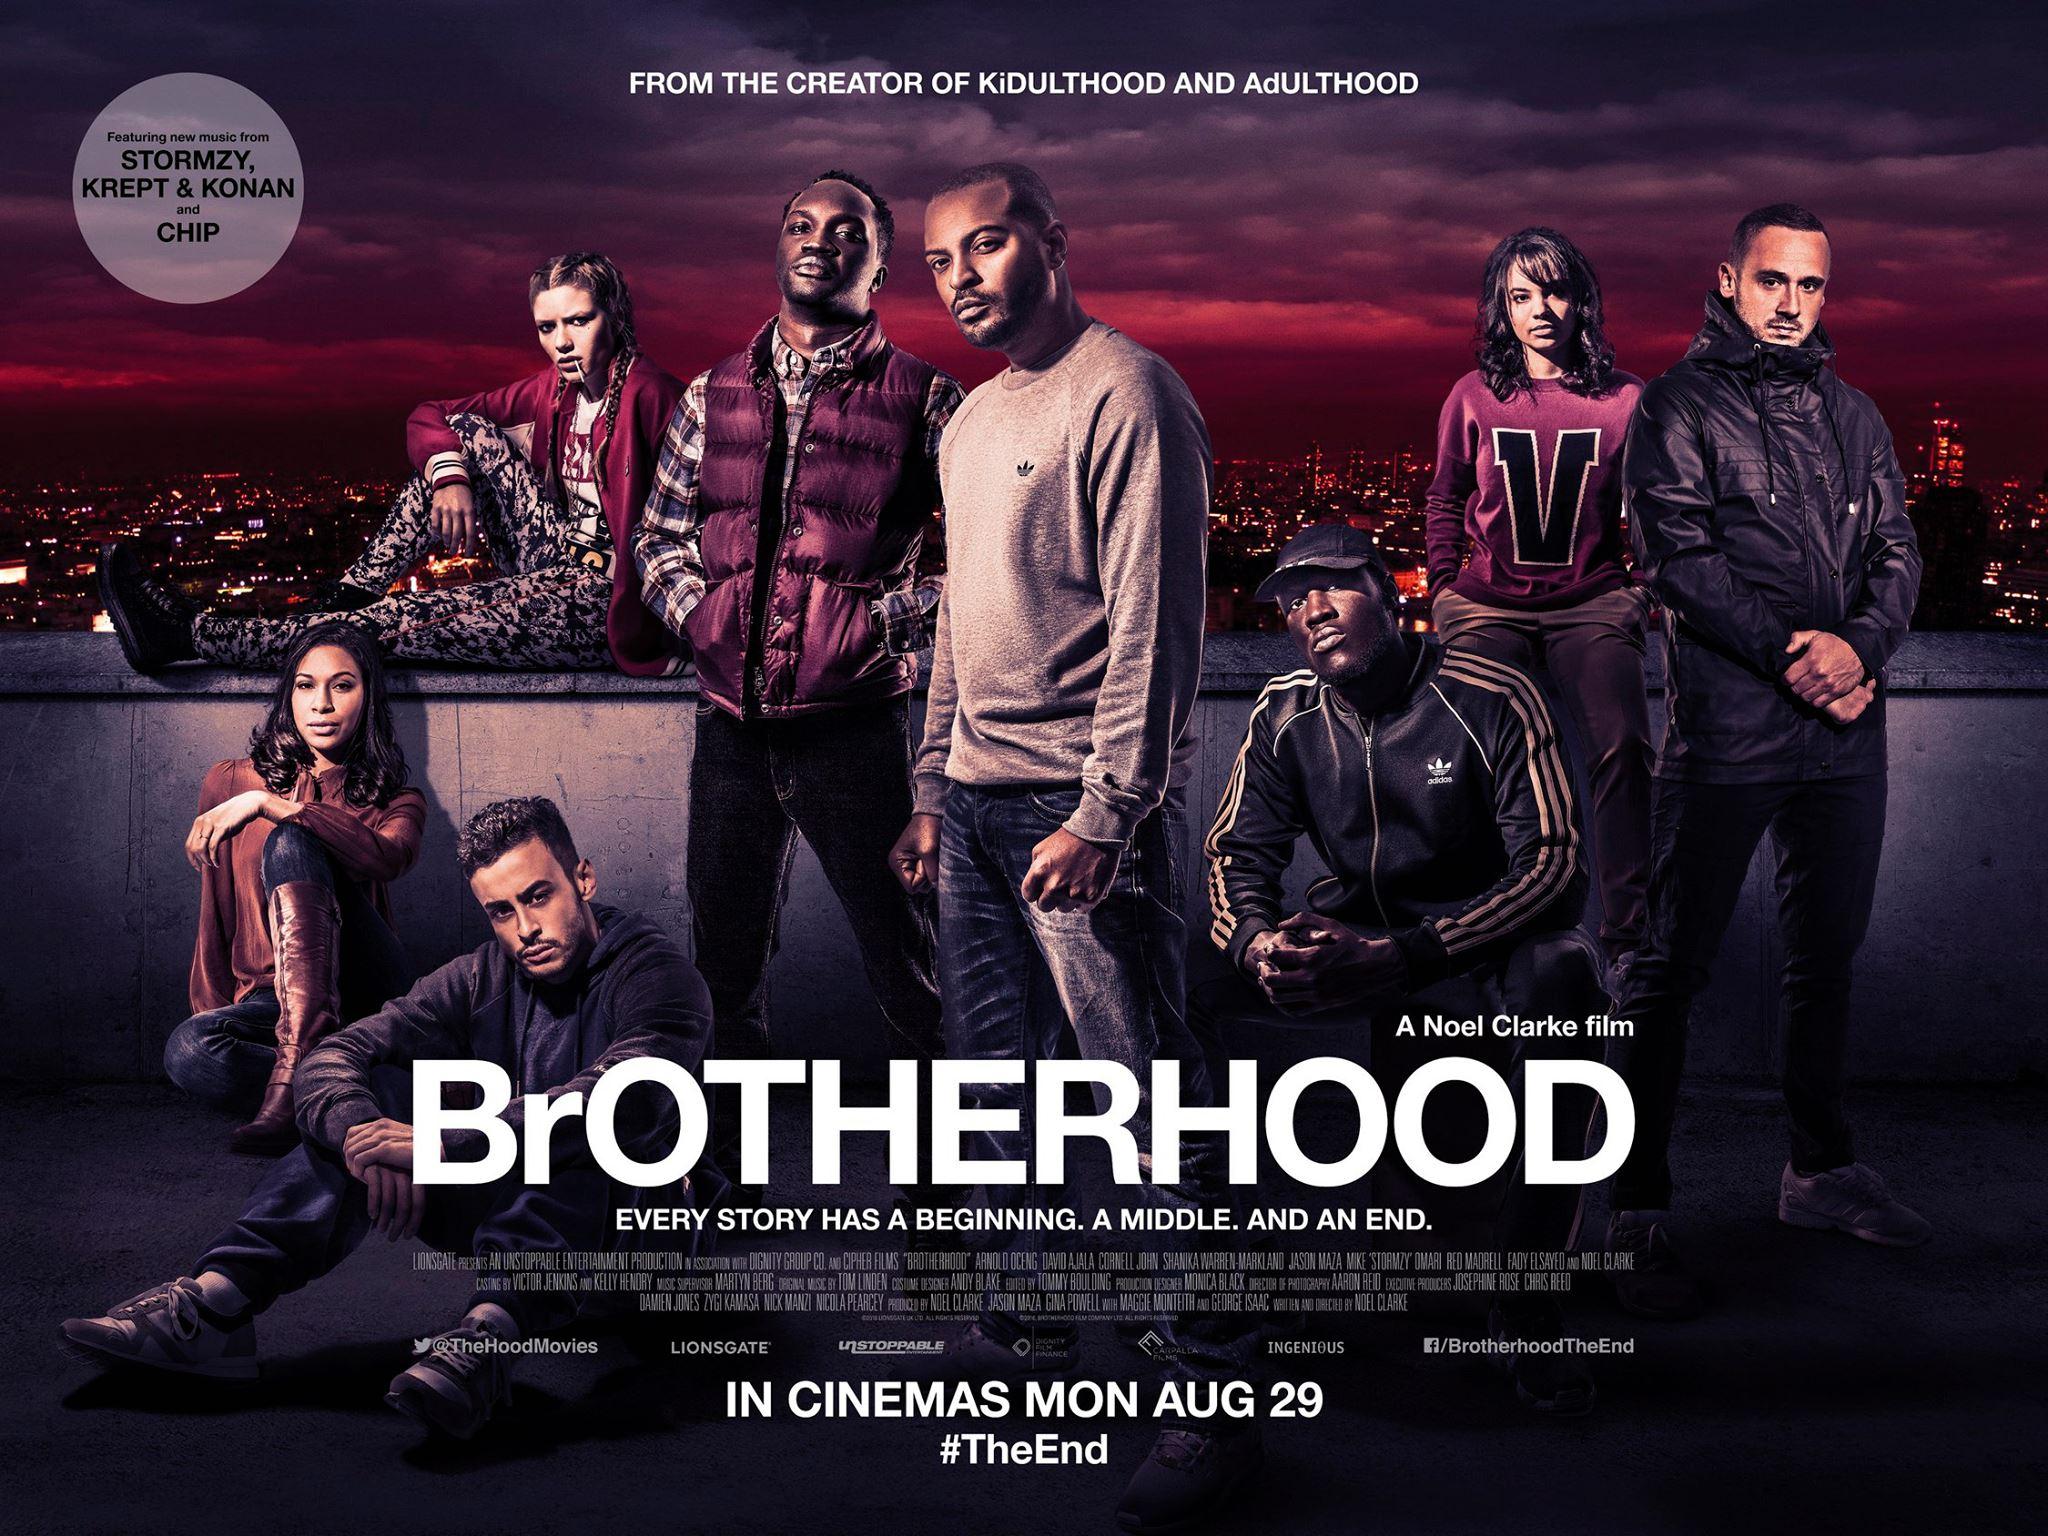 brotherhood krept konan stormzy p money